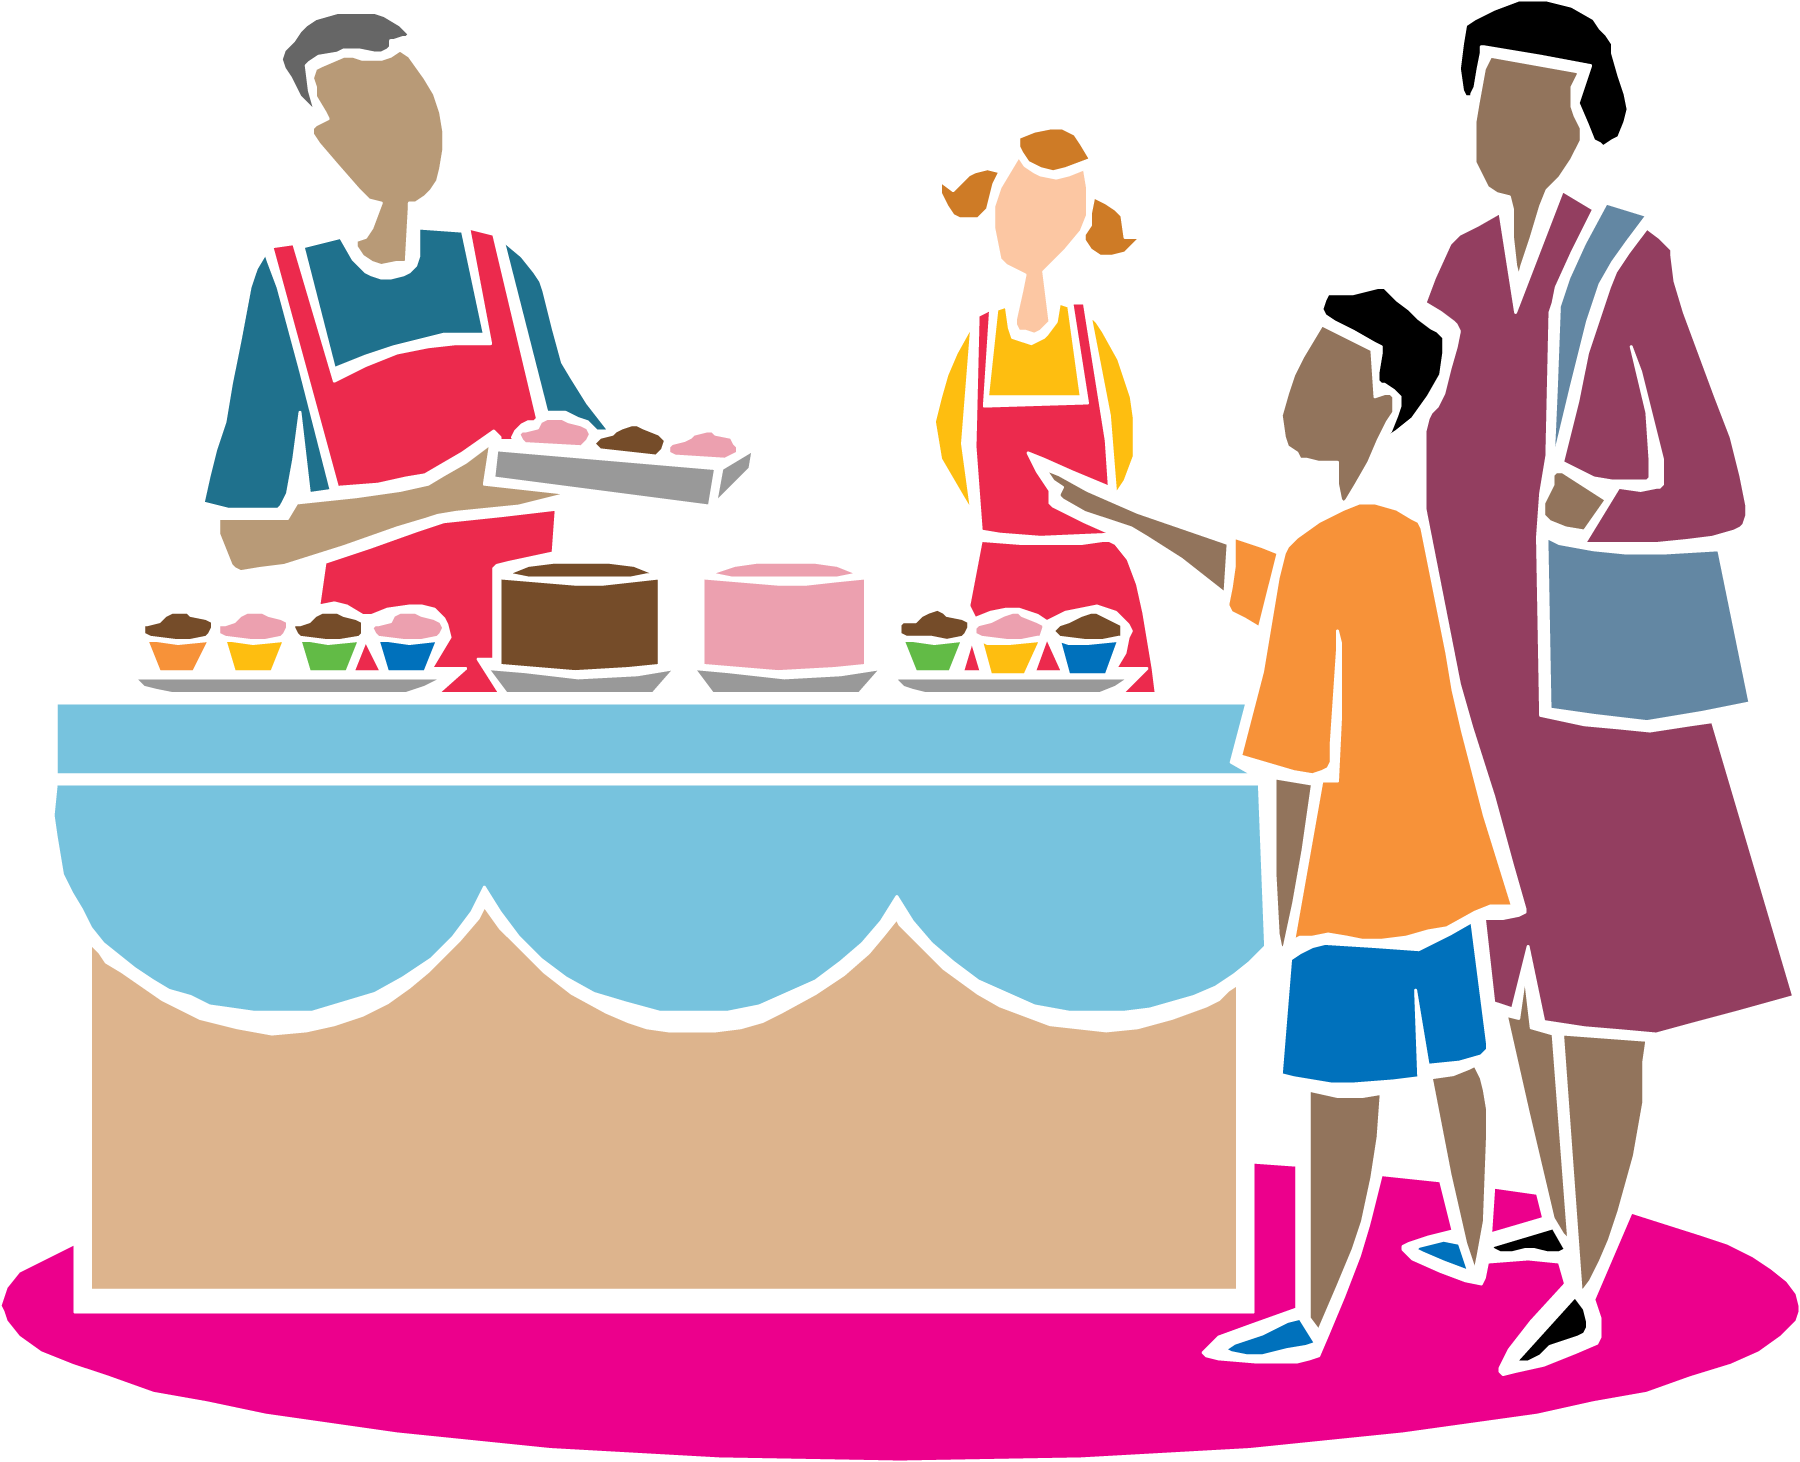 Fundraiser clipart summer. Crockpot and cakewalk this